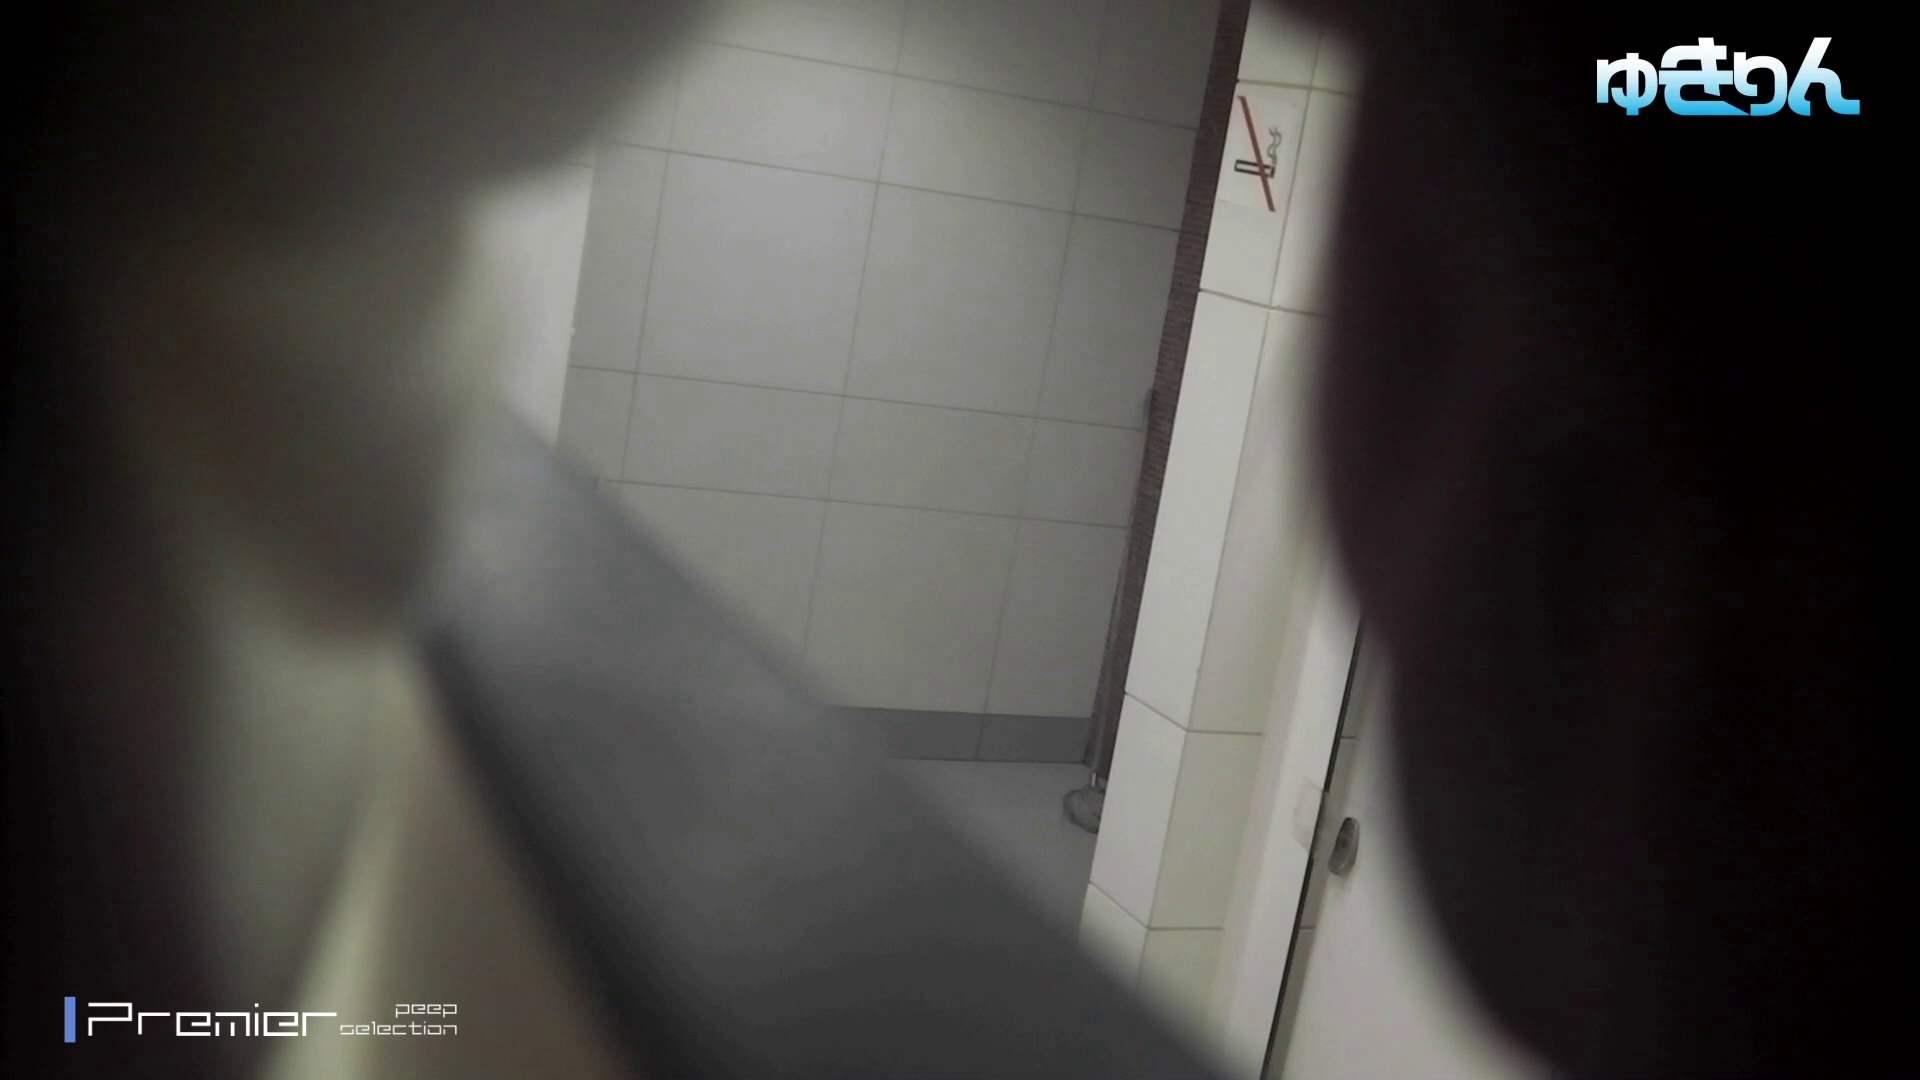 cm友達同士三人グループの二人を同時に捕獲【新世界の射窓からNo120】 洗面所  58pic 22